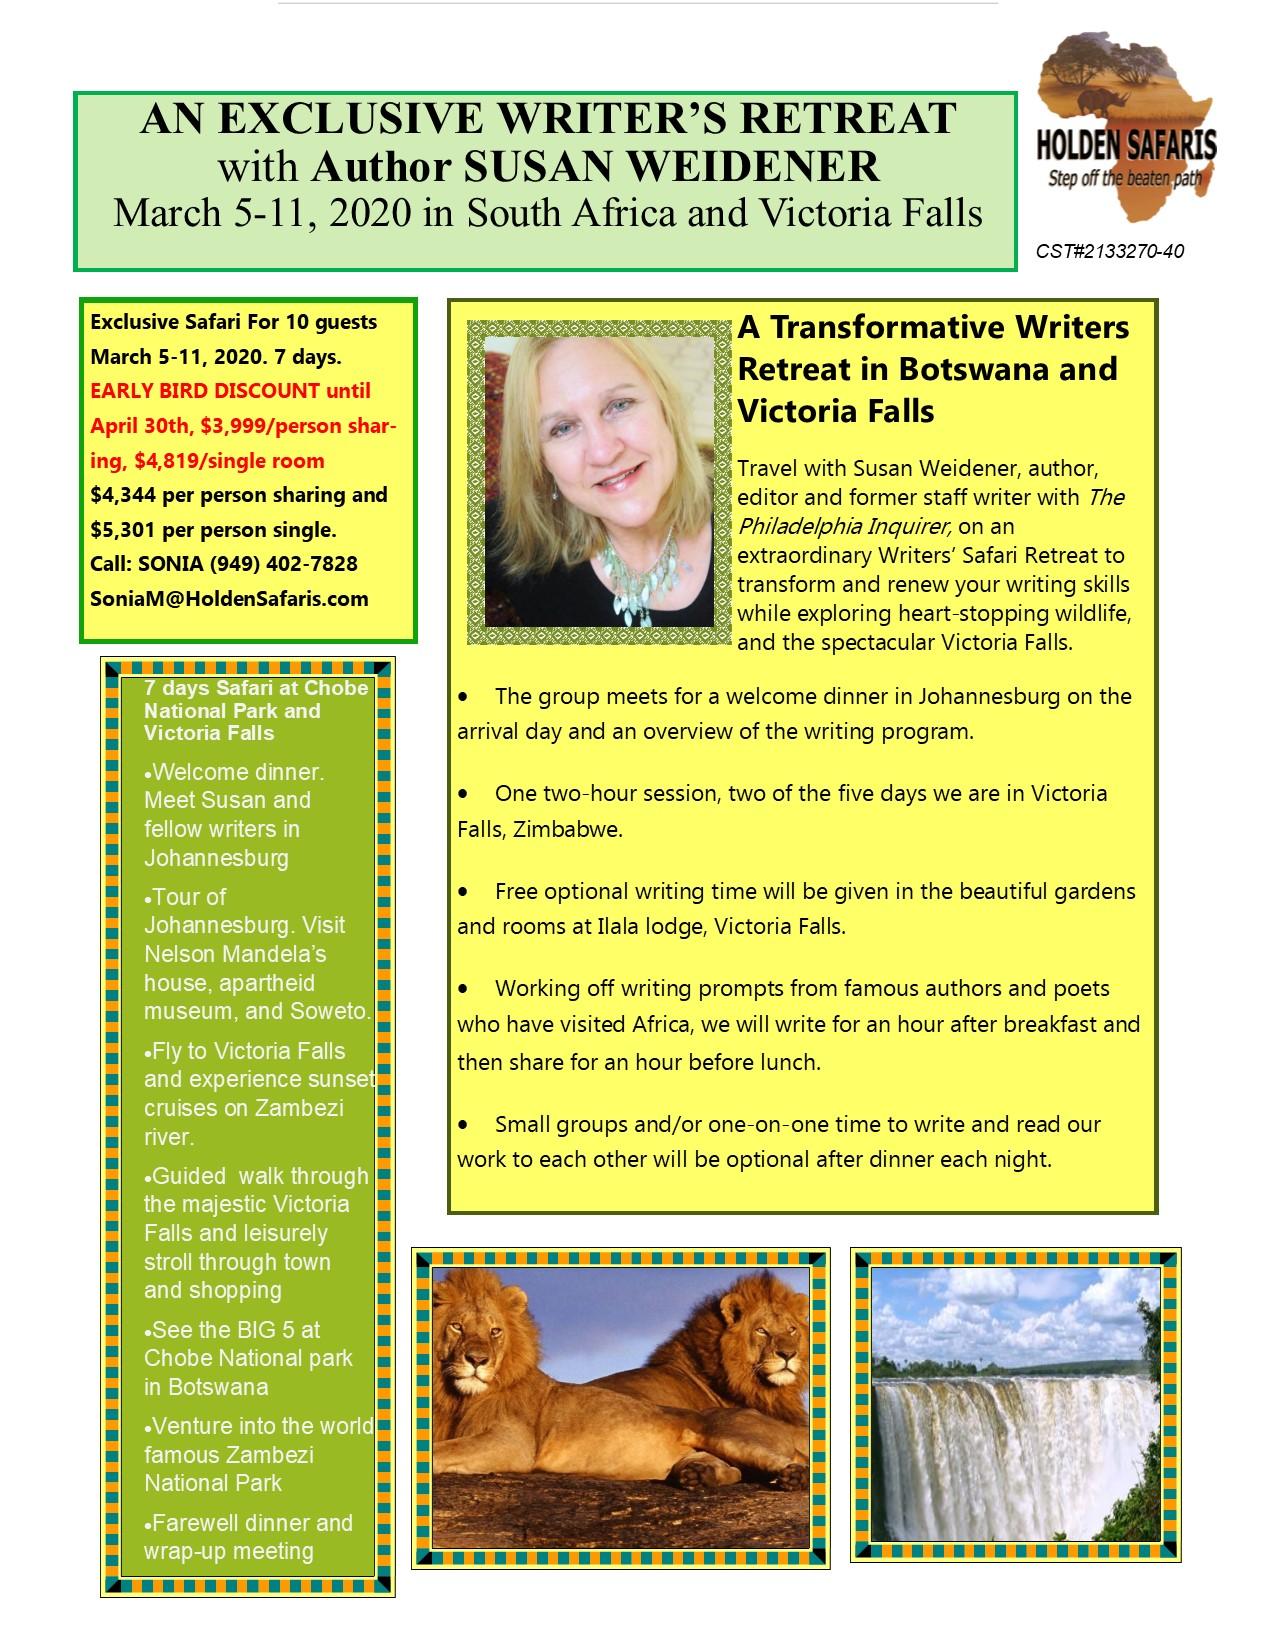 EARLY-BIRD DISCOUNT FLYER-WRITERS RETREAT- Susan Weidener-Preliminary-March 2020